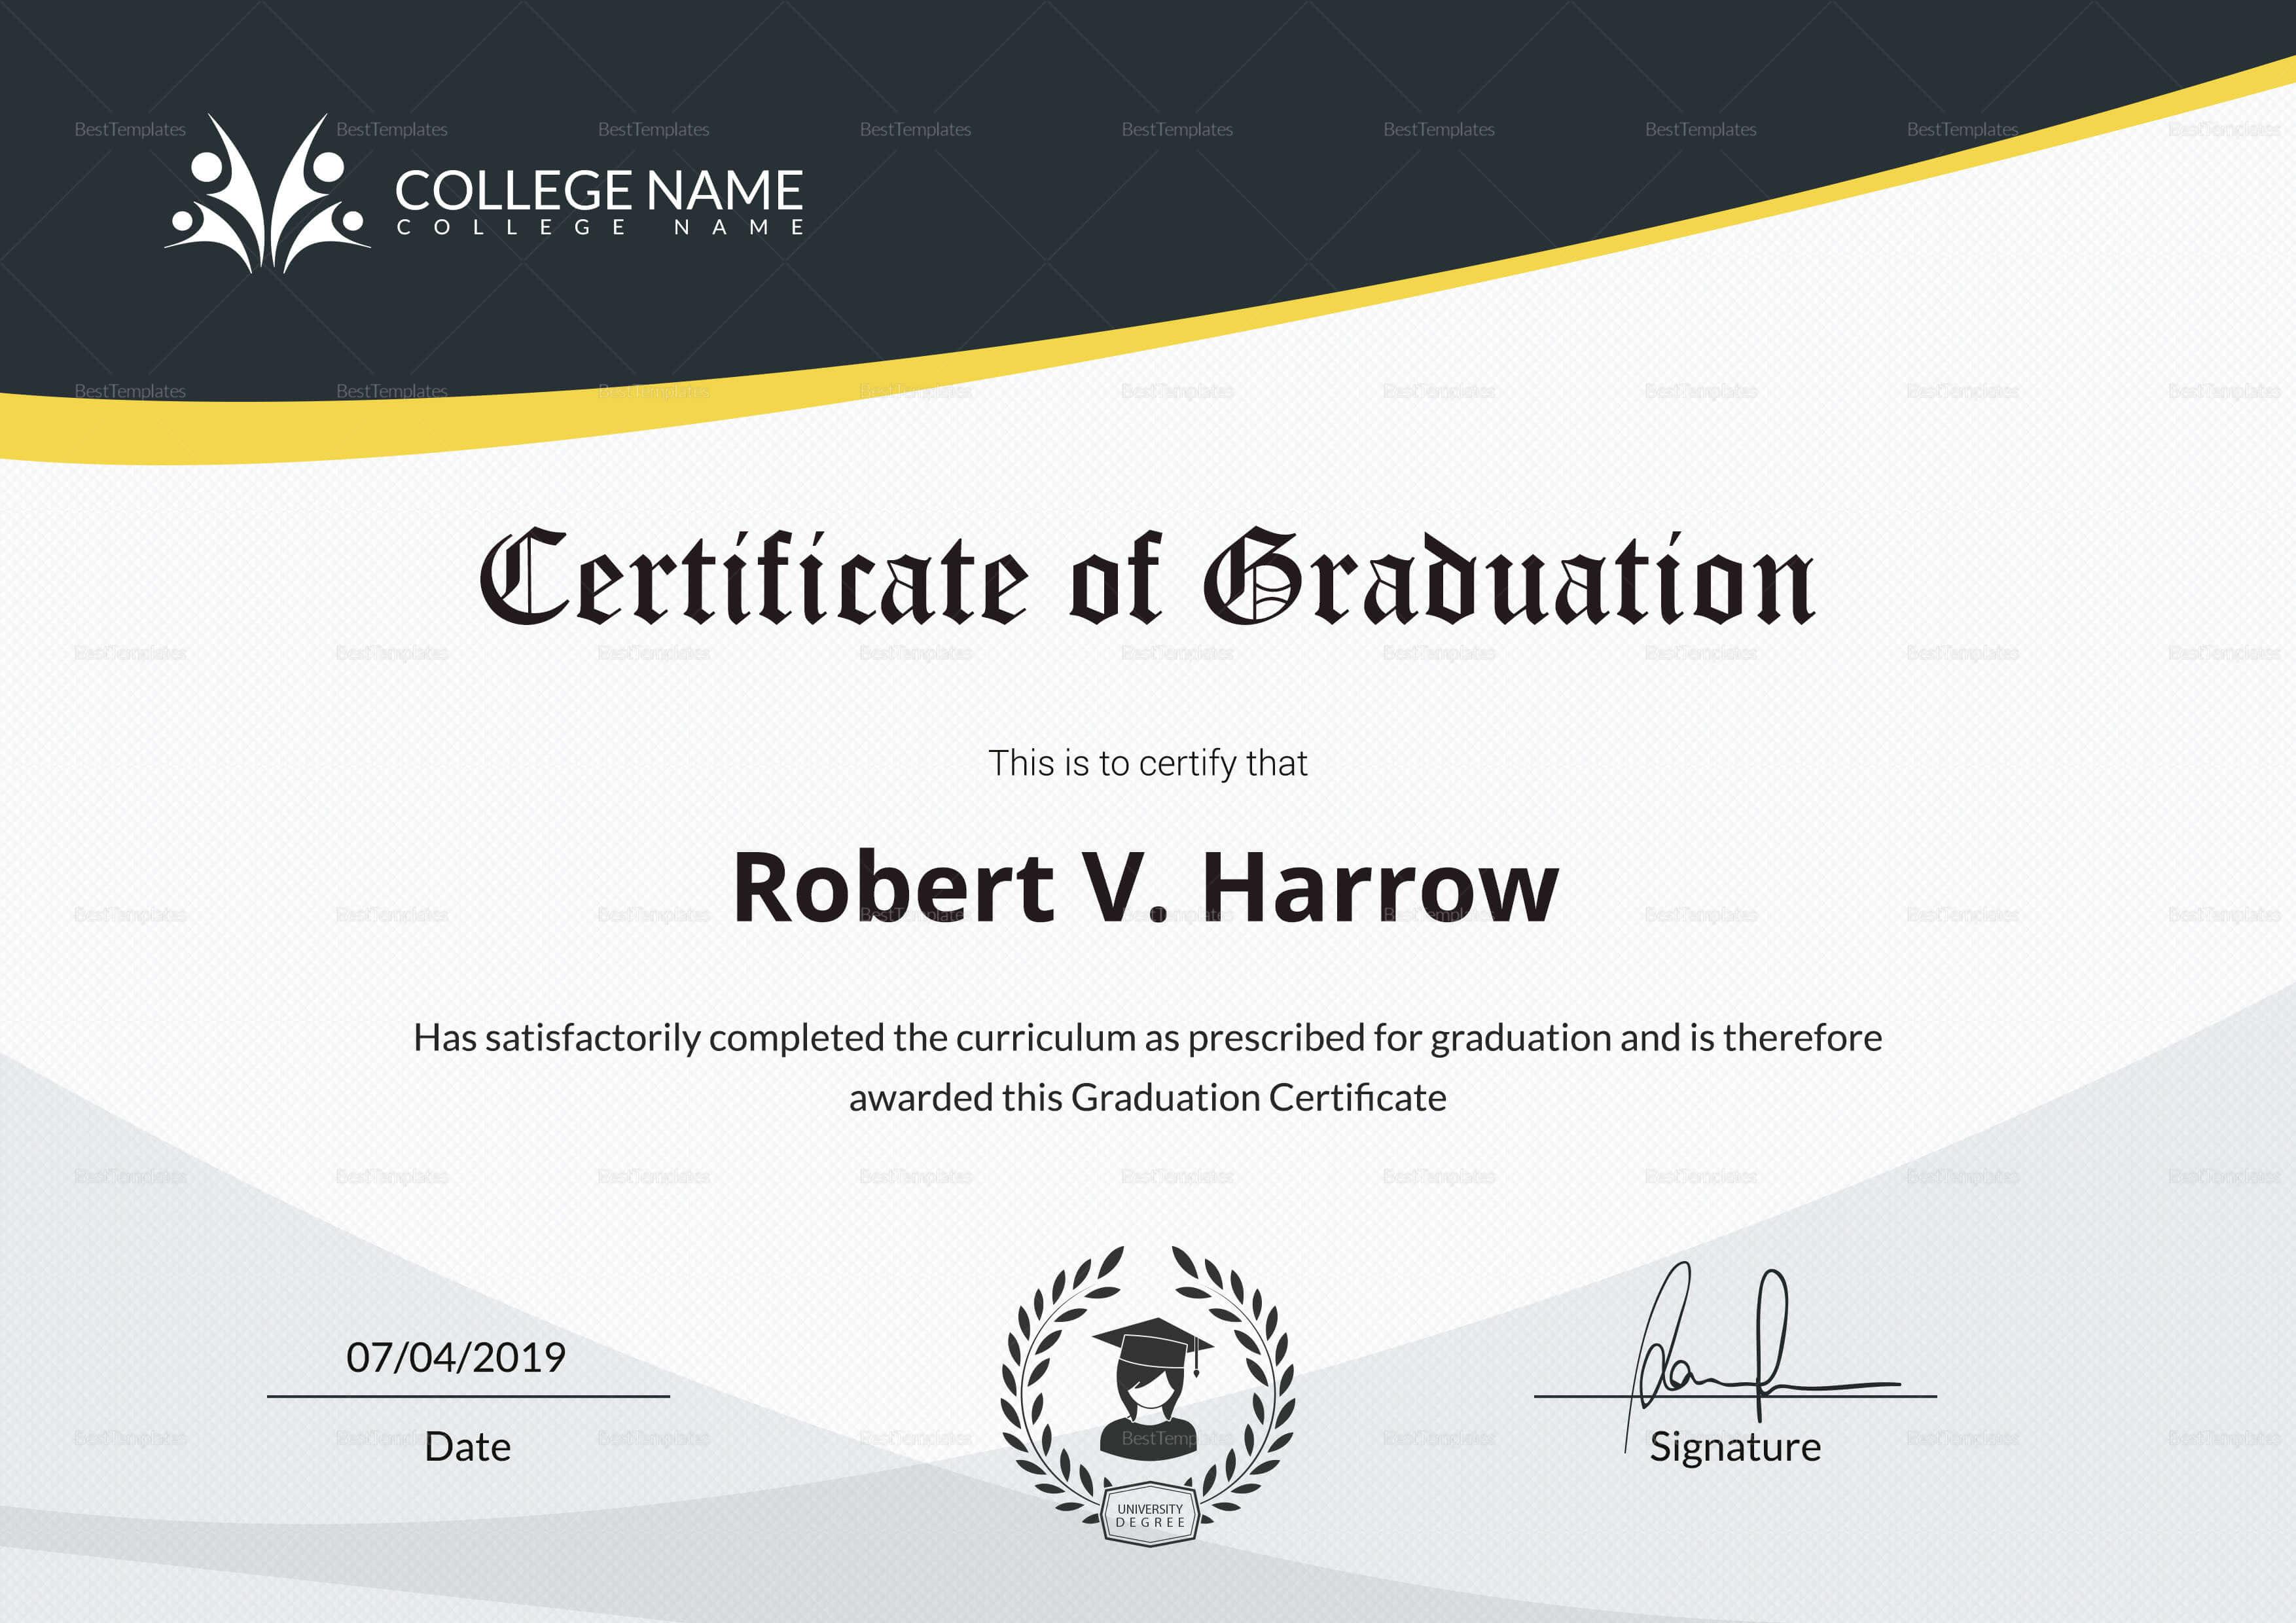 Universal College Graduation Certificate Template Inside College Graduation Certificate Template